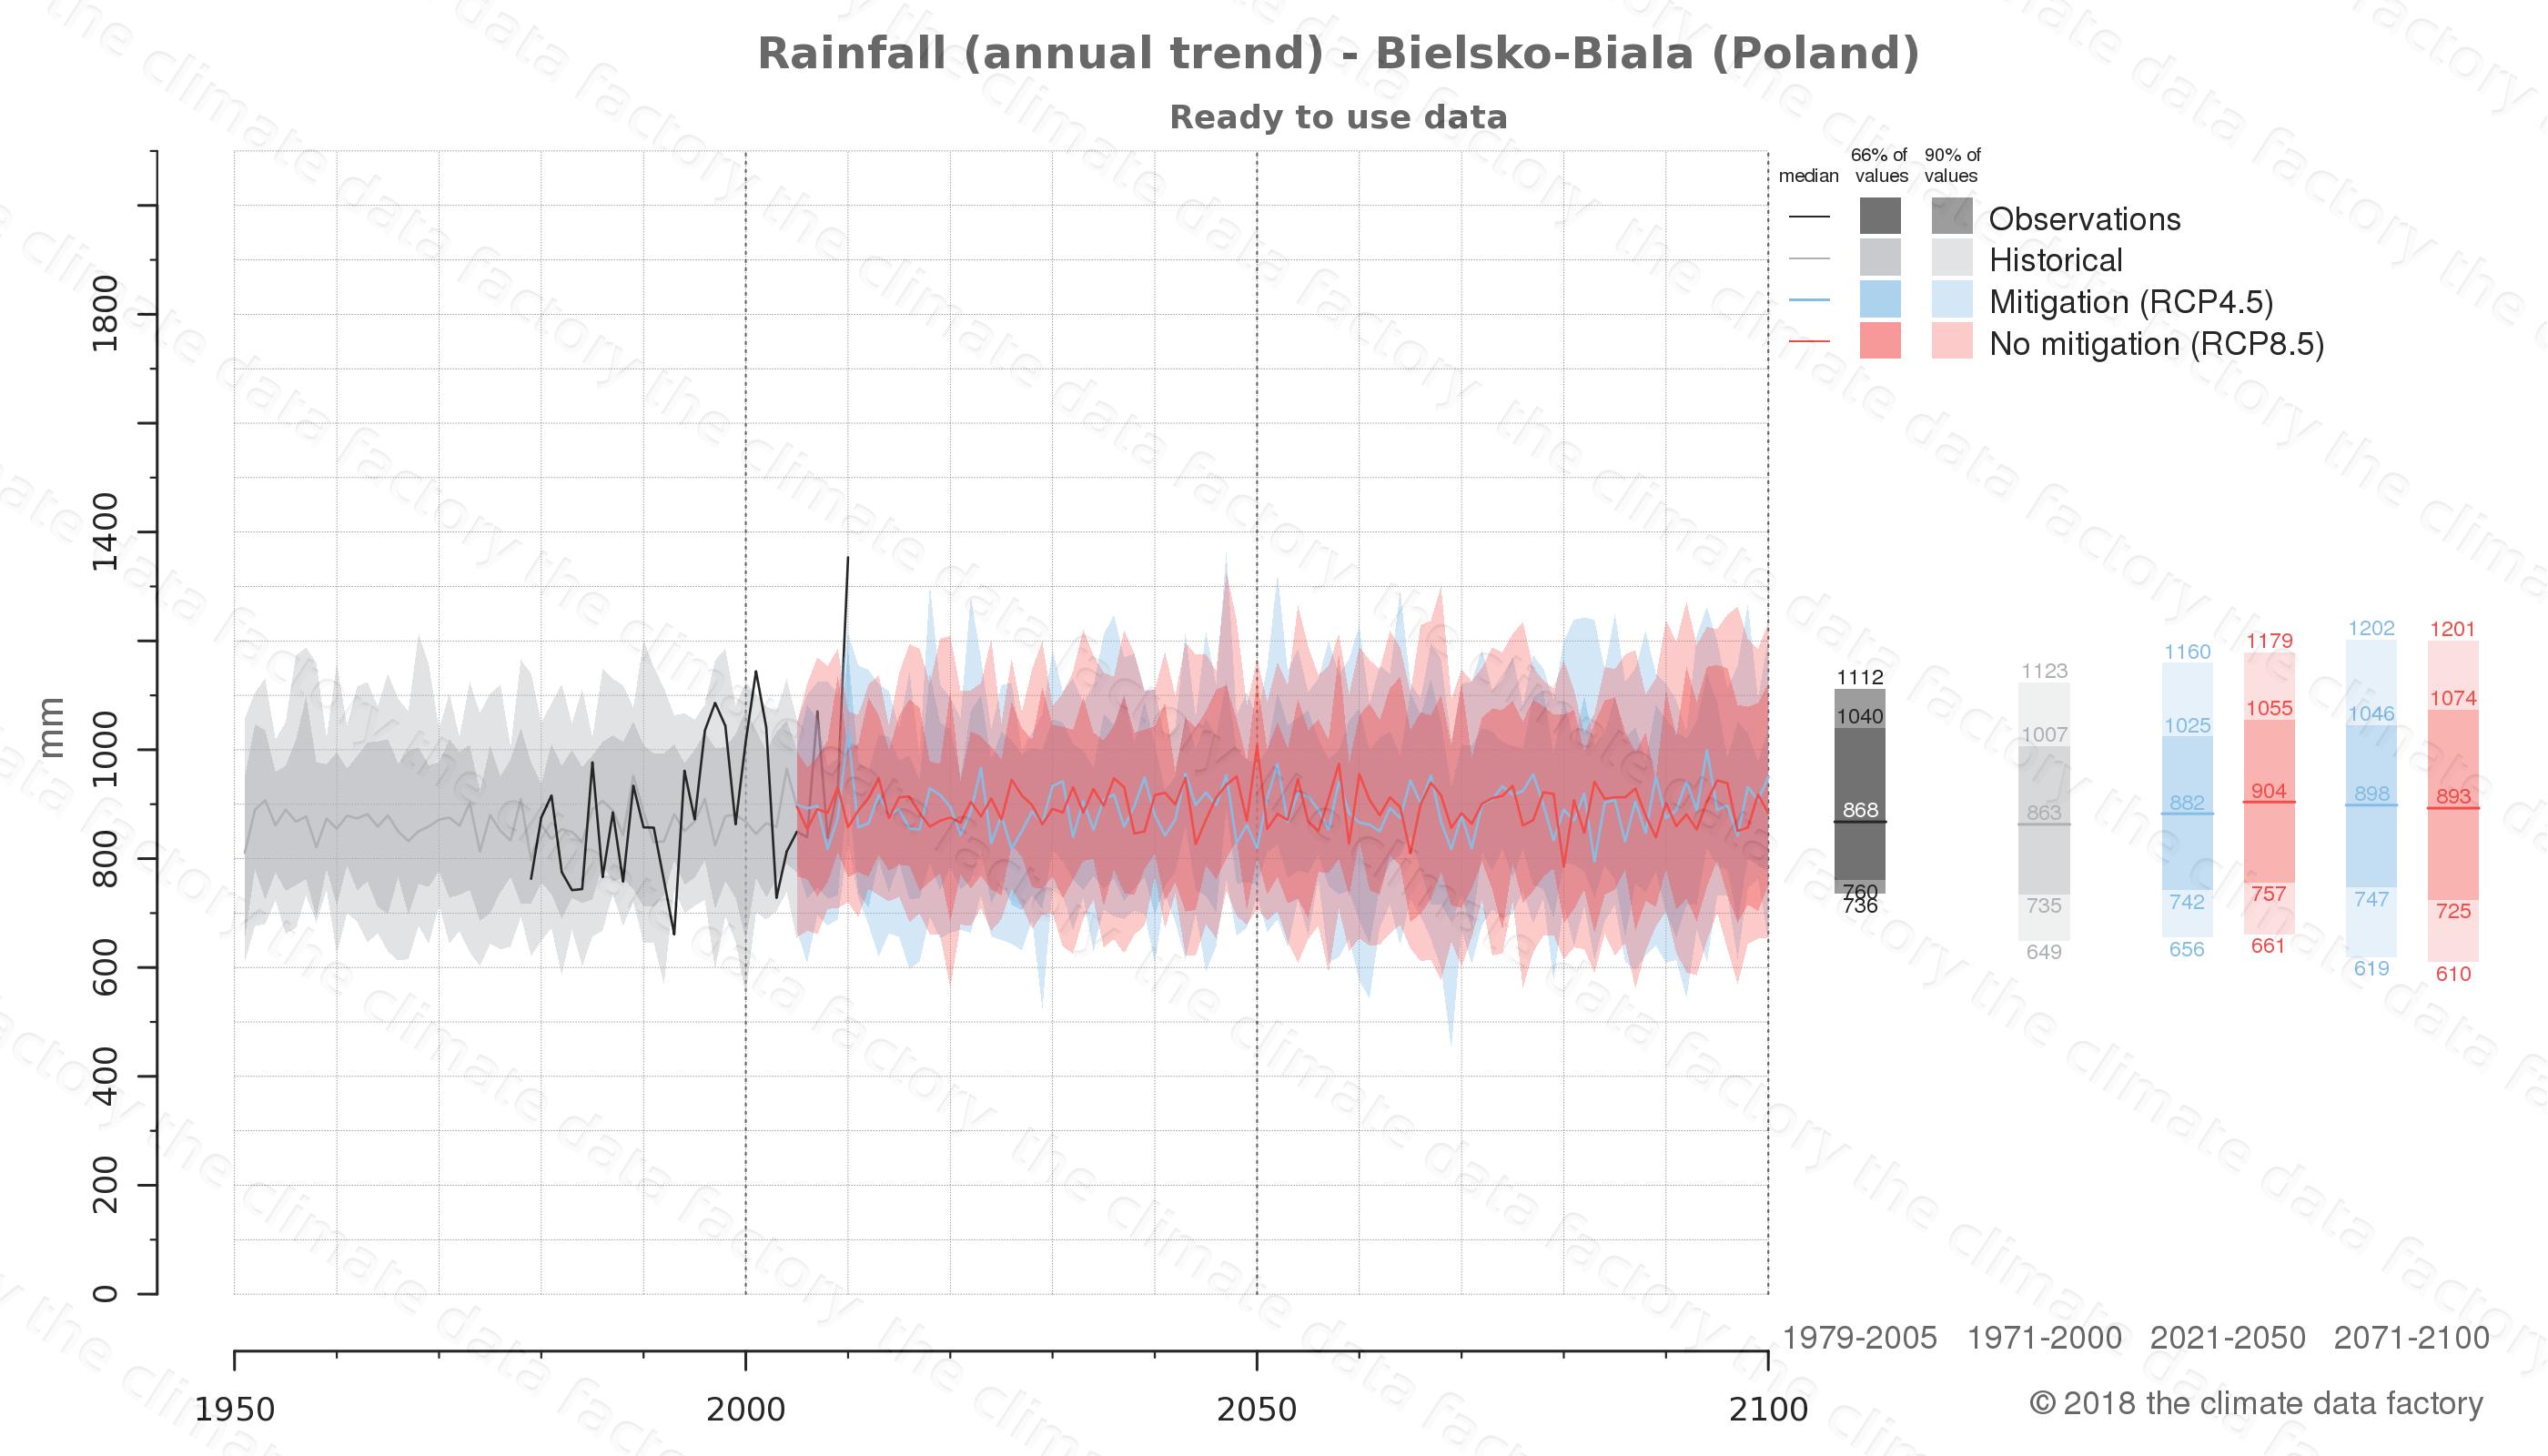 climate change data policy adaptation climate graph city data rainfall bielsko-biala poland